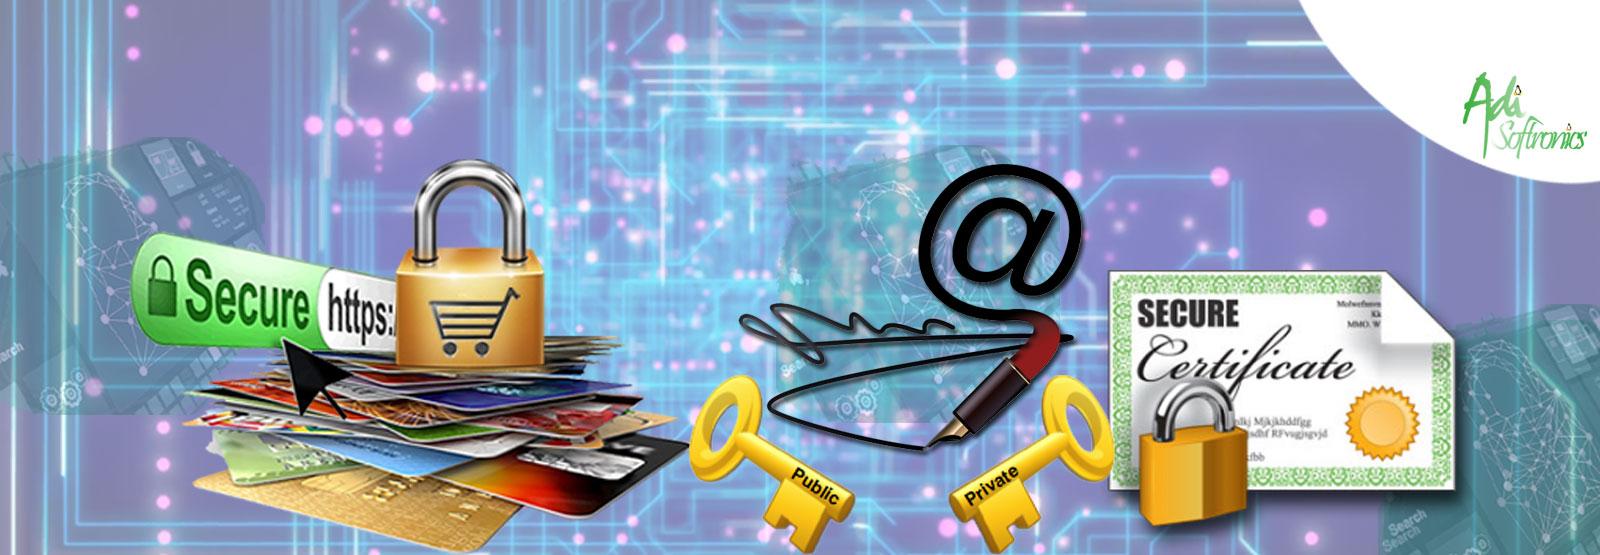 Buy Digital Signature Online